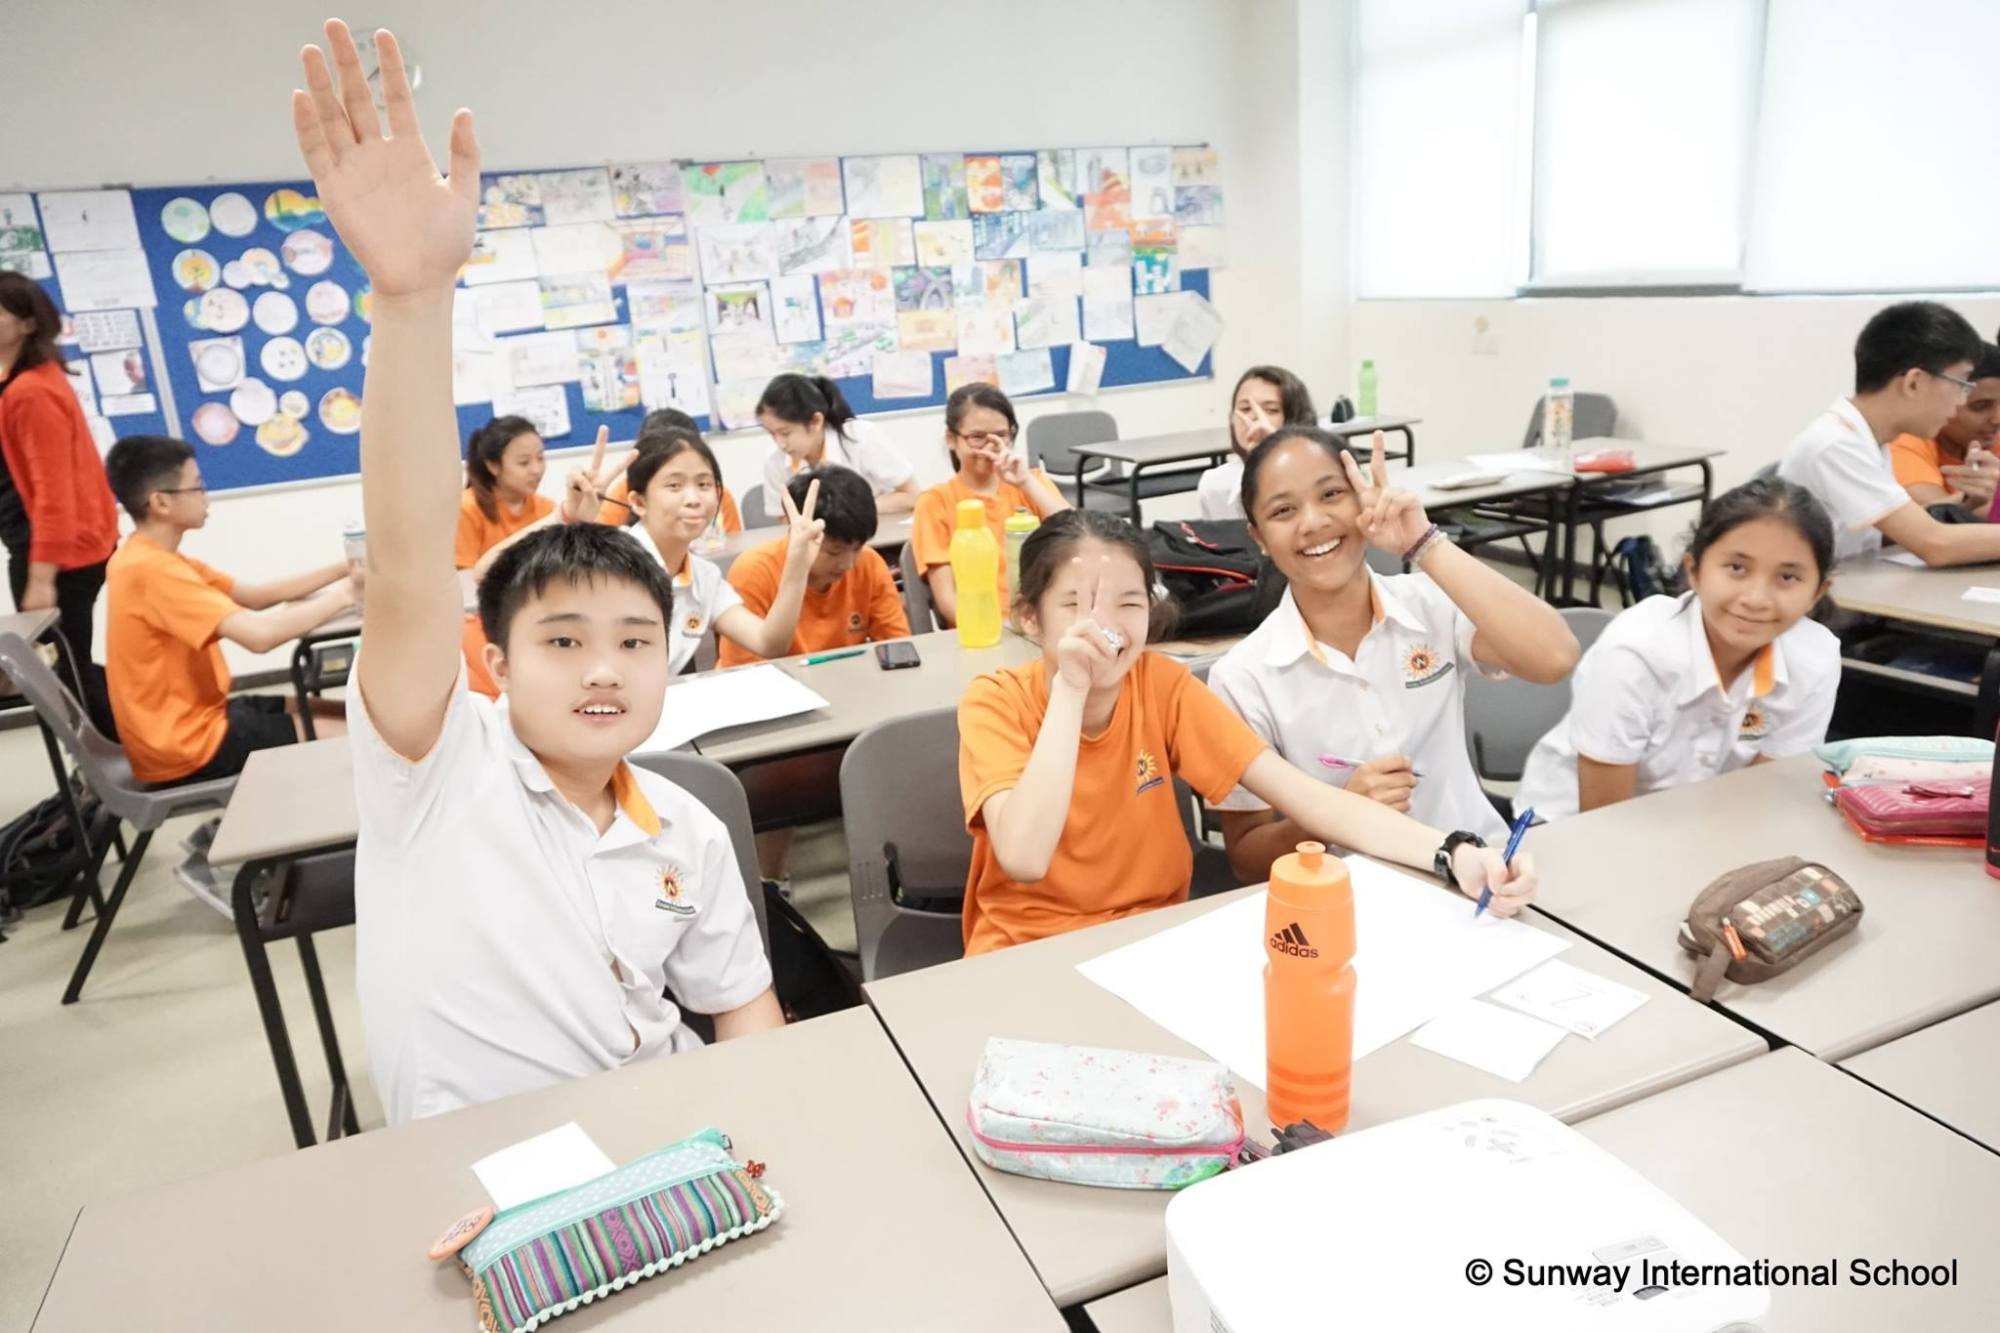 hight resolution of The Ontario Curriculum - ExpatGo